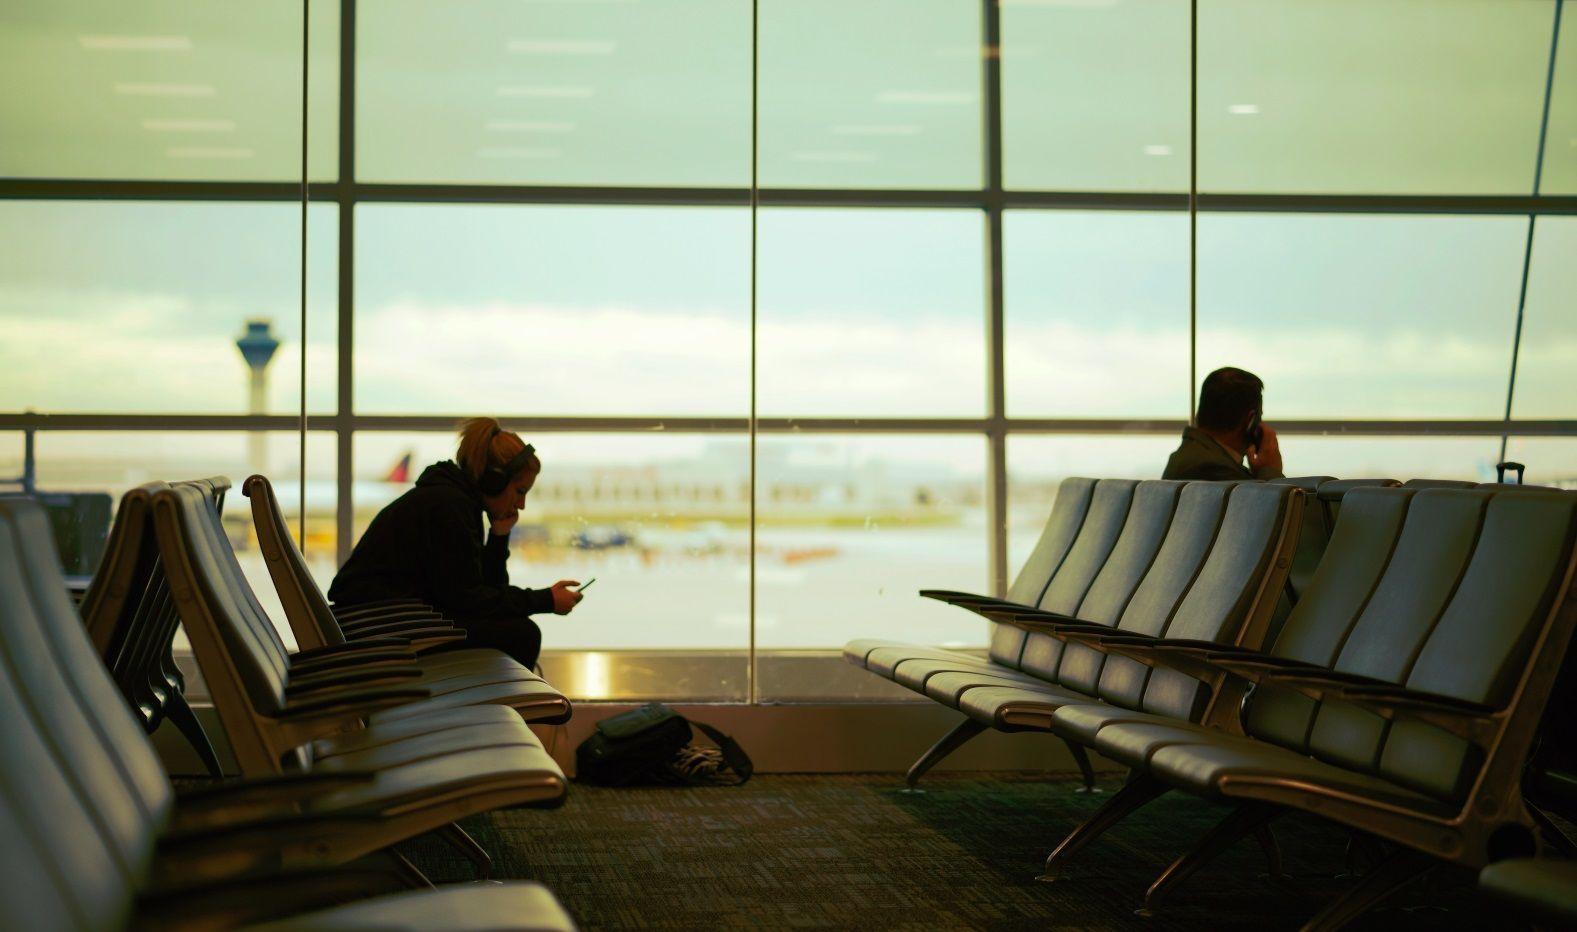 самолет аэропорт зал ожидания